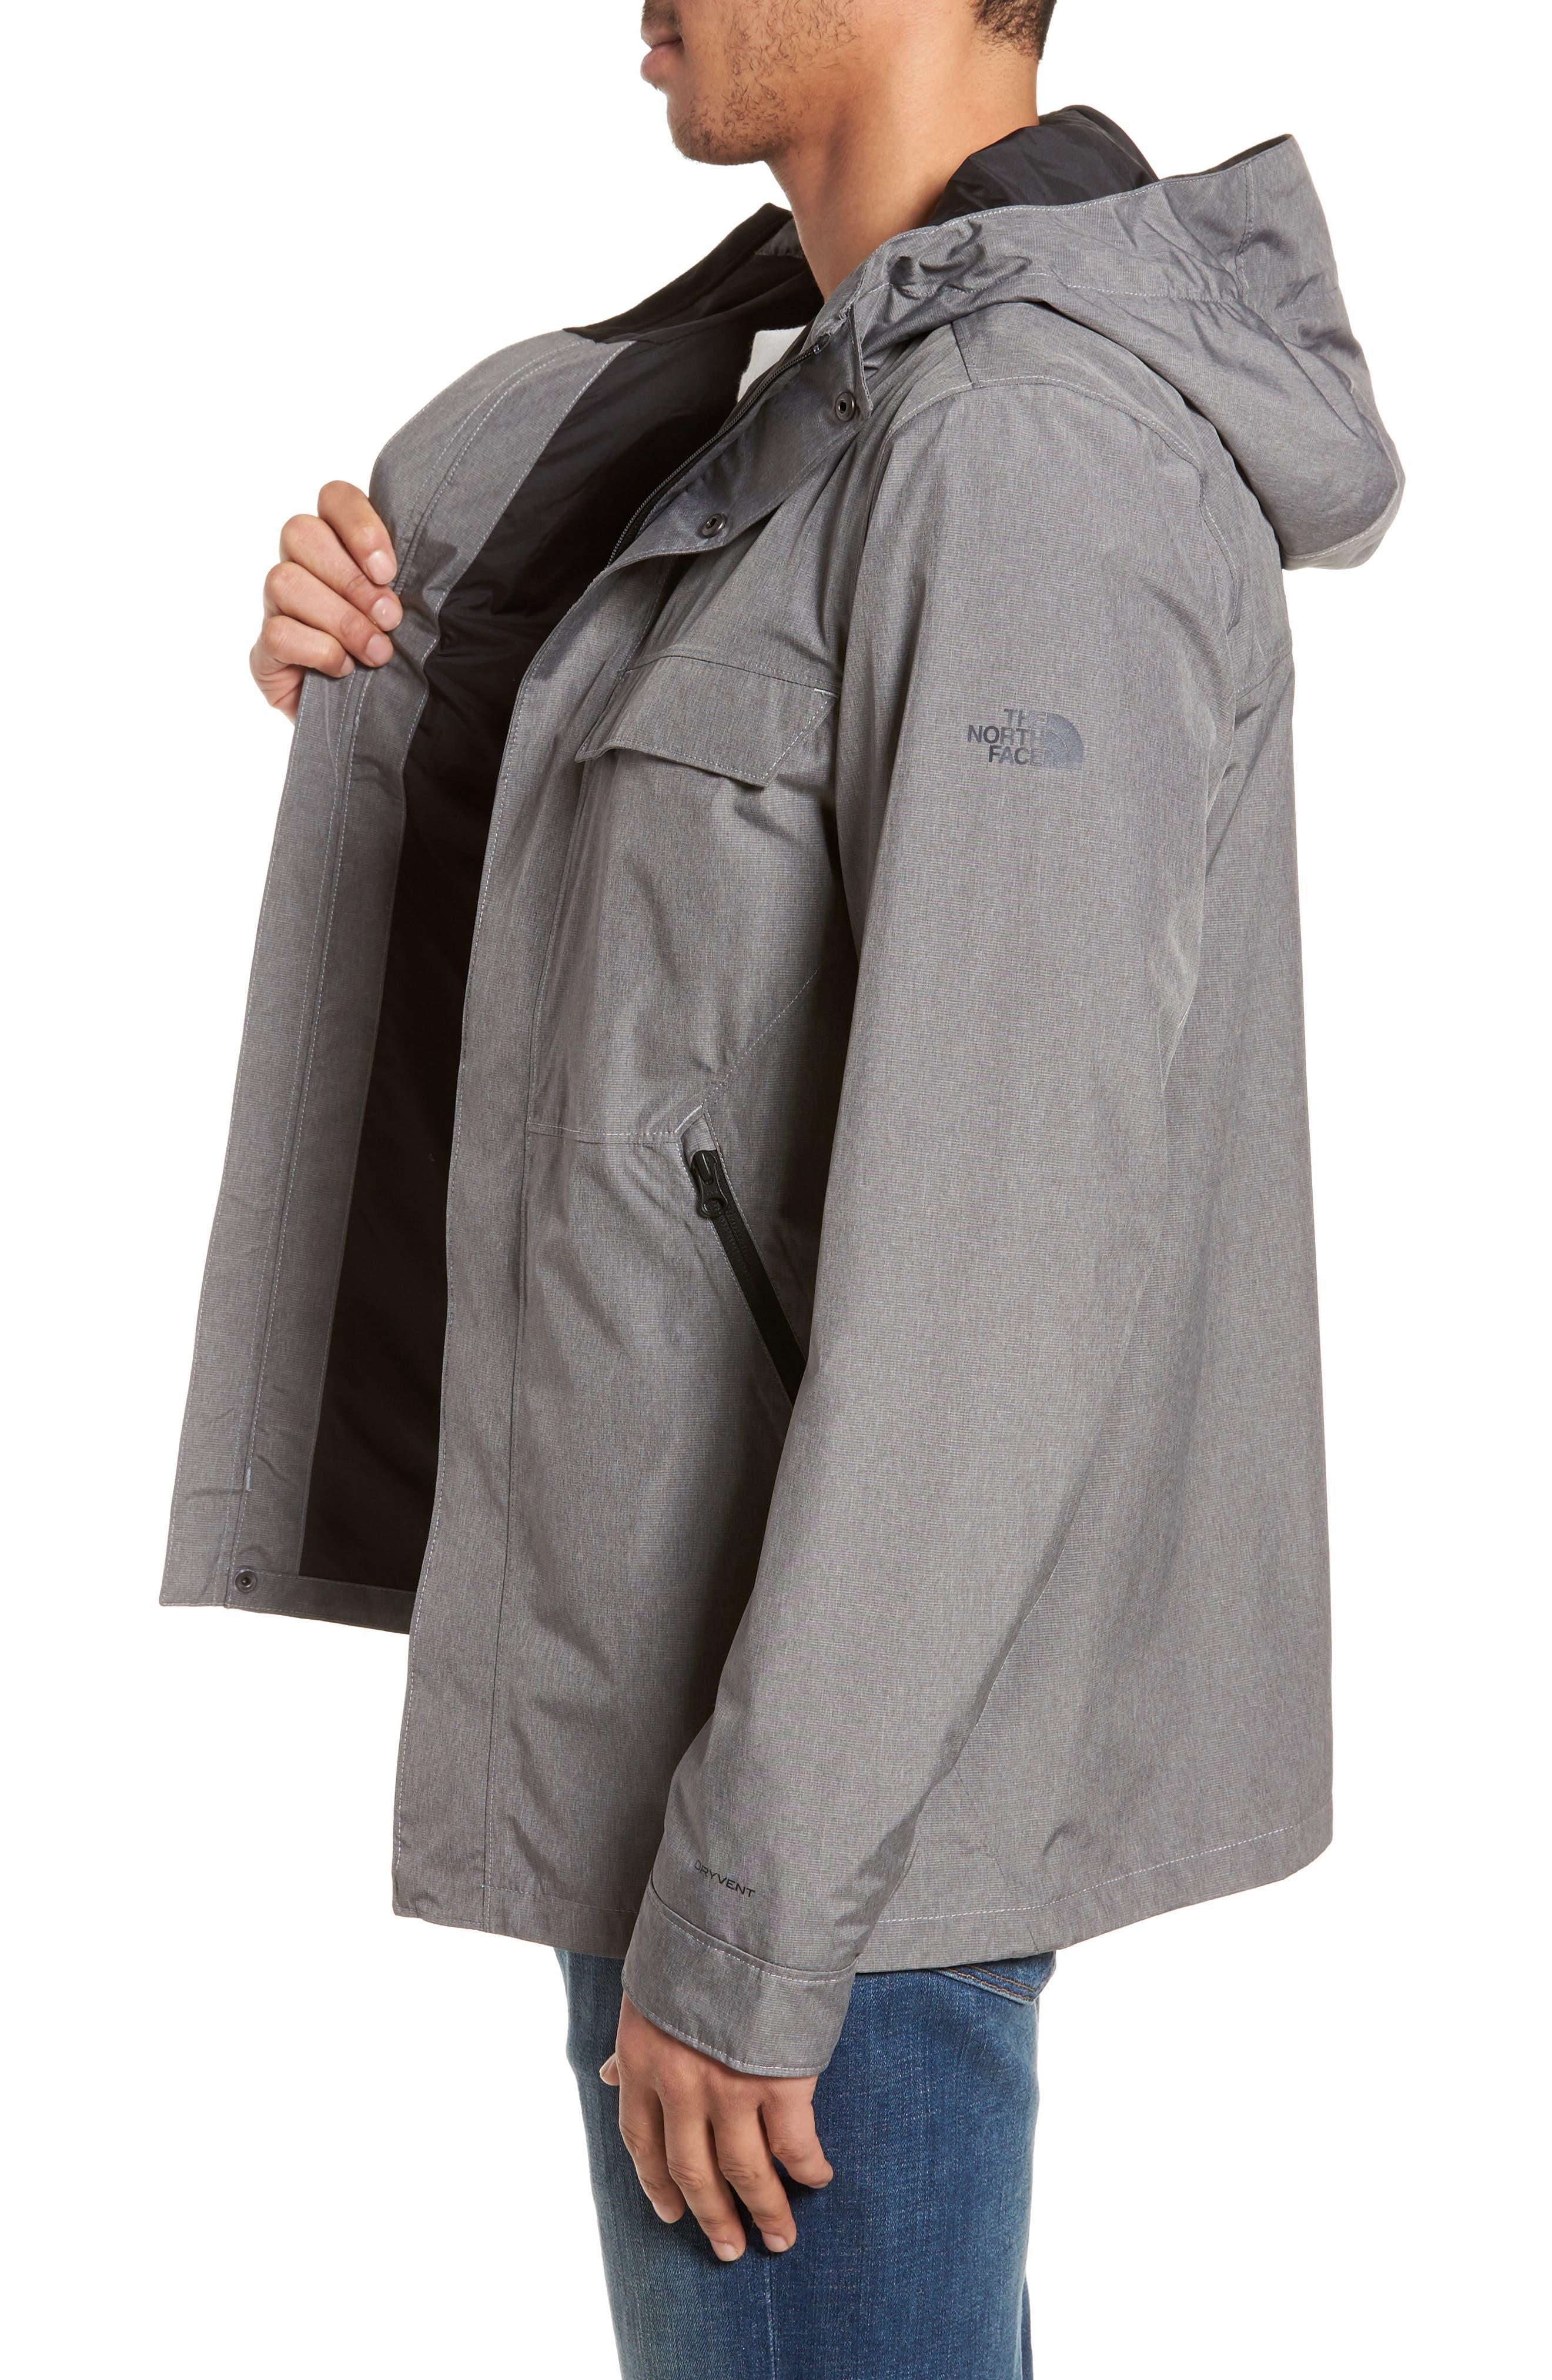 Jenison II Insulated Waterproof Jacket,                             Alternate thumbnail 3, color,                             TNF MEDIUM GREY HEATHER